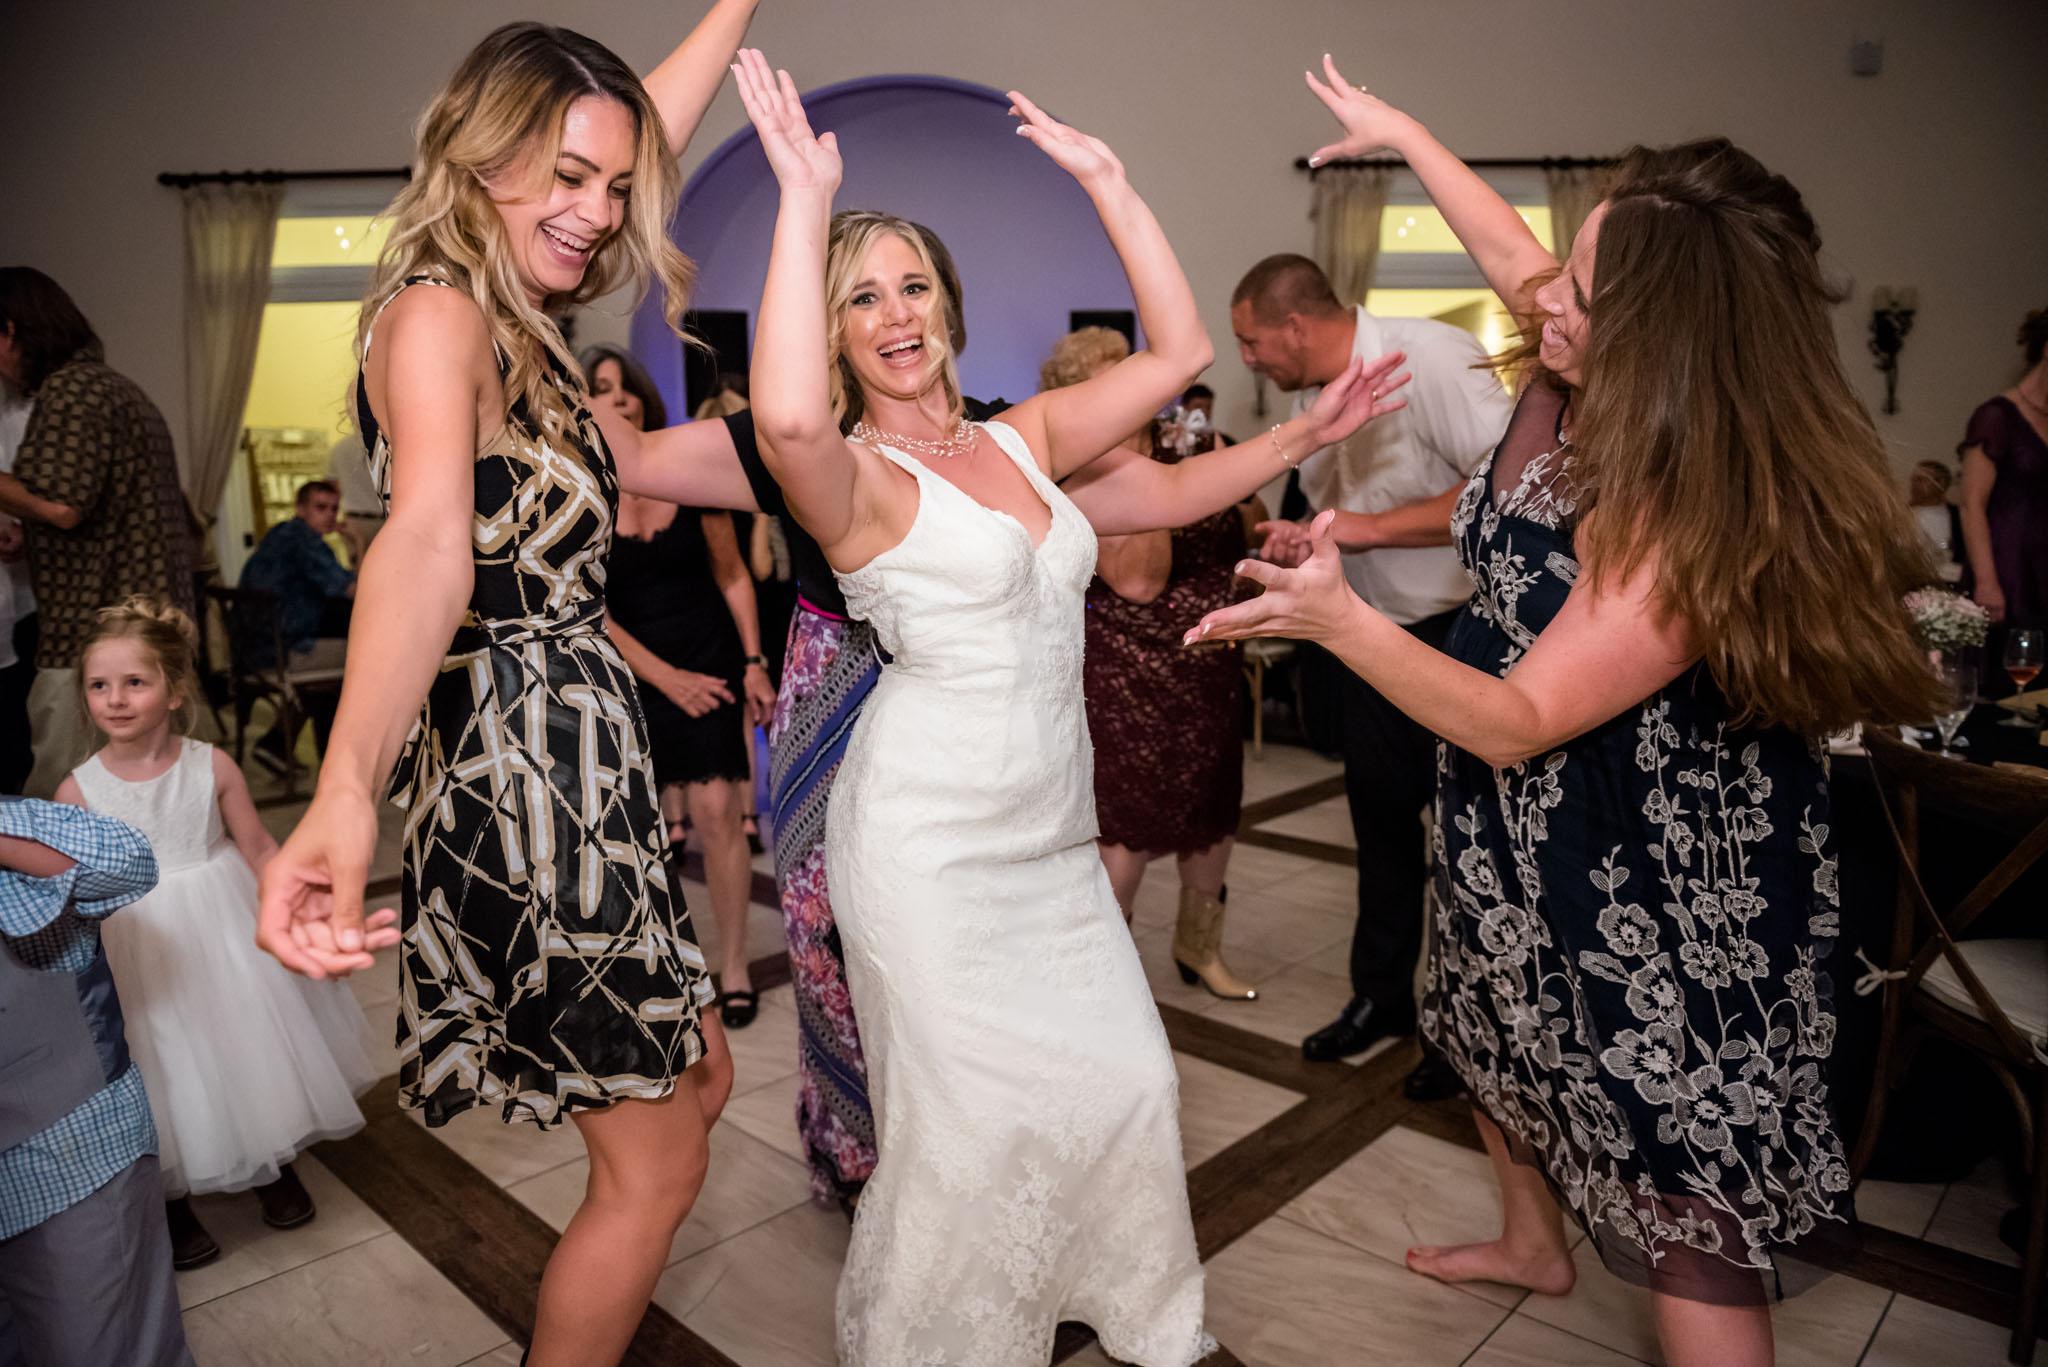 Avensole-Winery-Temecula-Wedding-Josh-and-Olivia-4220.JPG